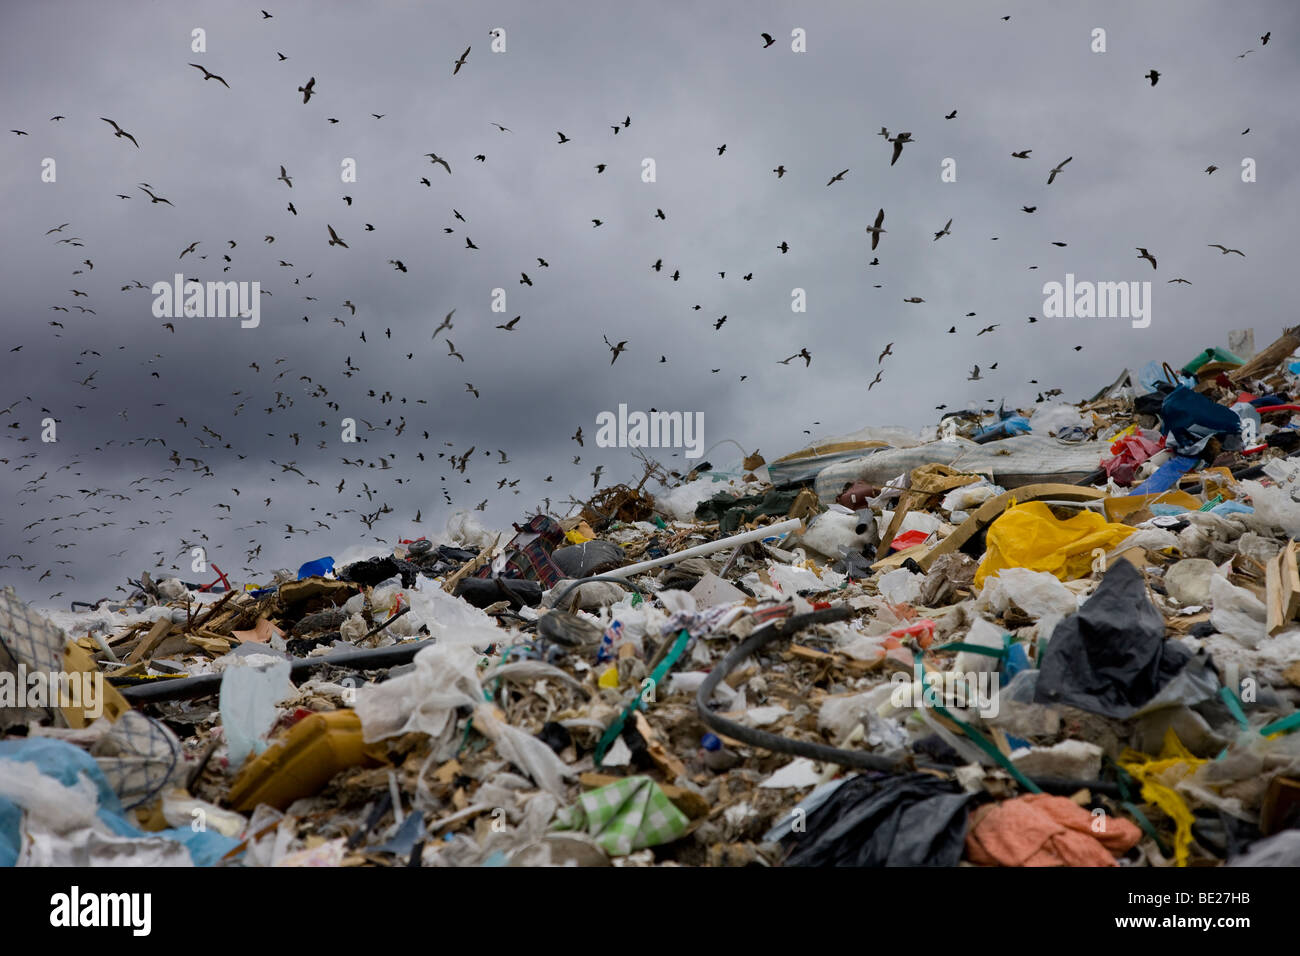 Landfill - Stock Image